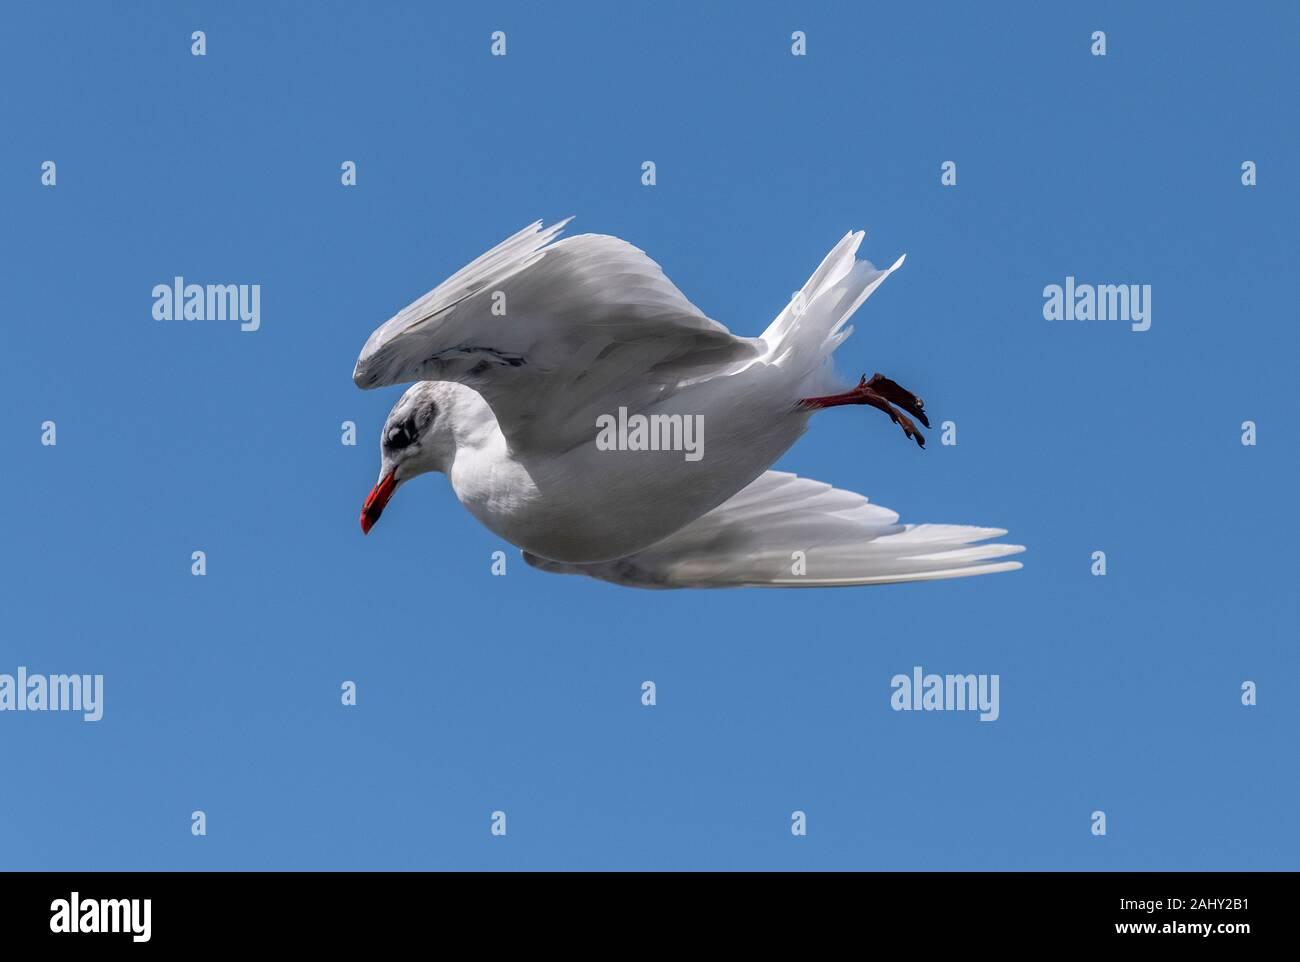 Black-headed Gull, Chroicocephalus ridibundus, in flight, in late summer plumage. Dorset coast. Stock Photo